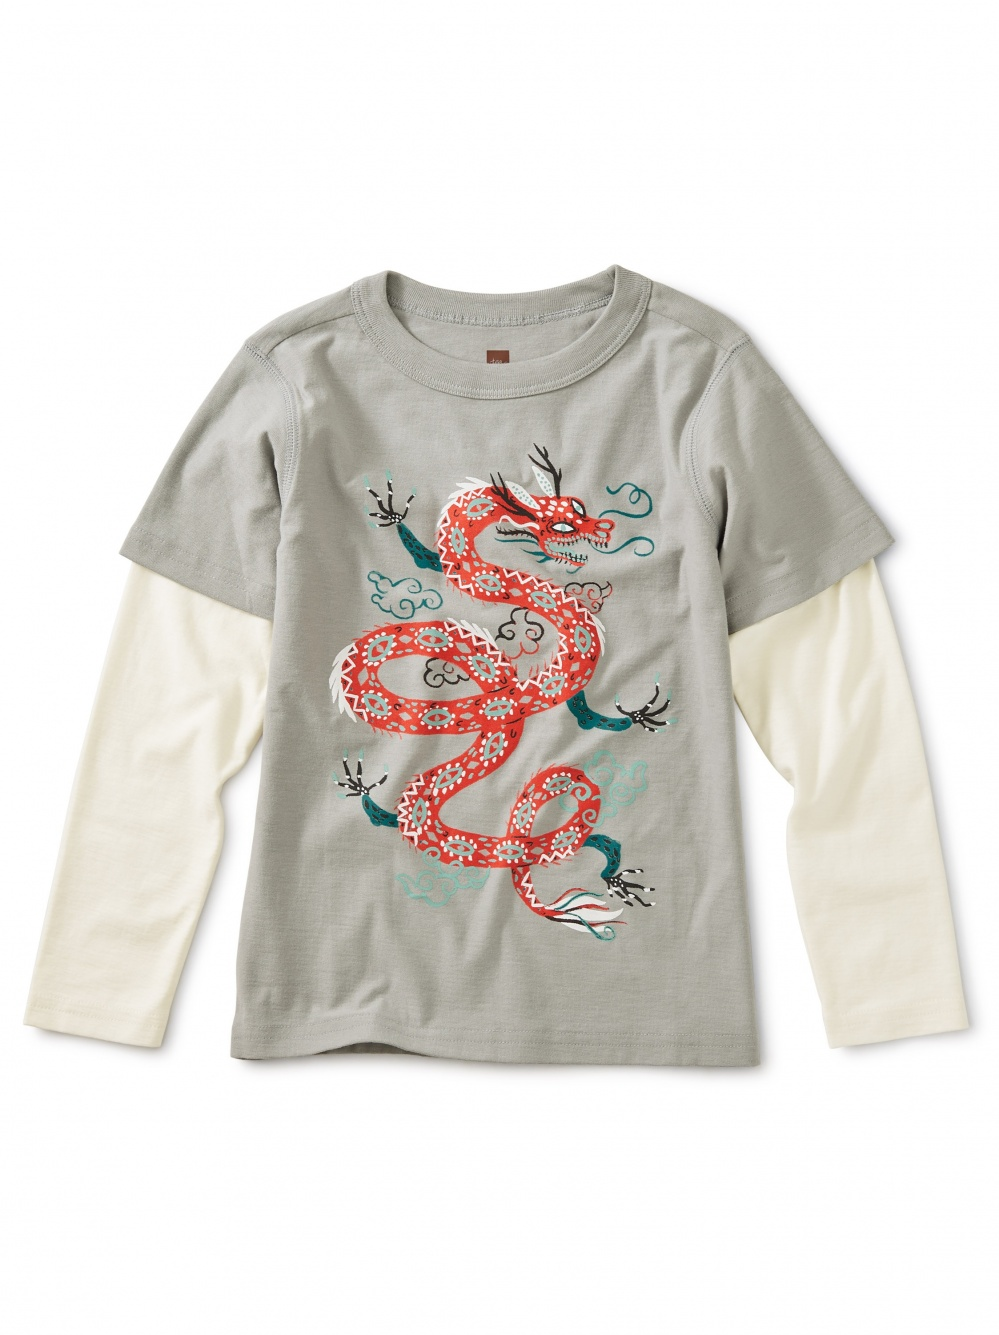 Fire Dragon Graphic Layered Tee